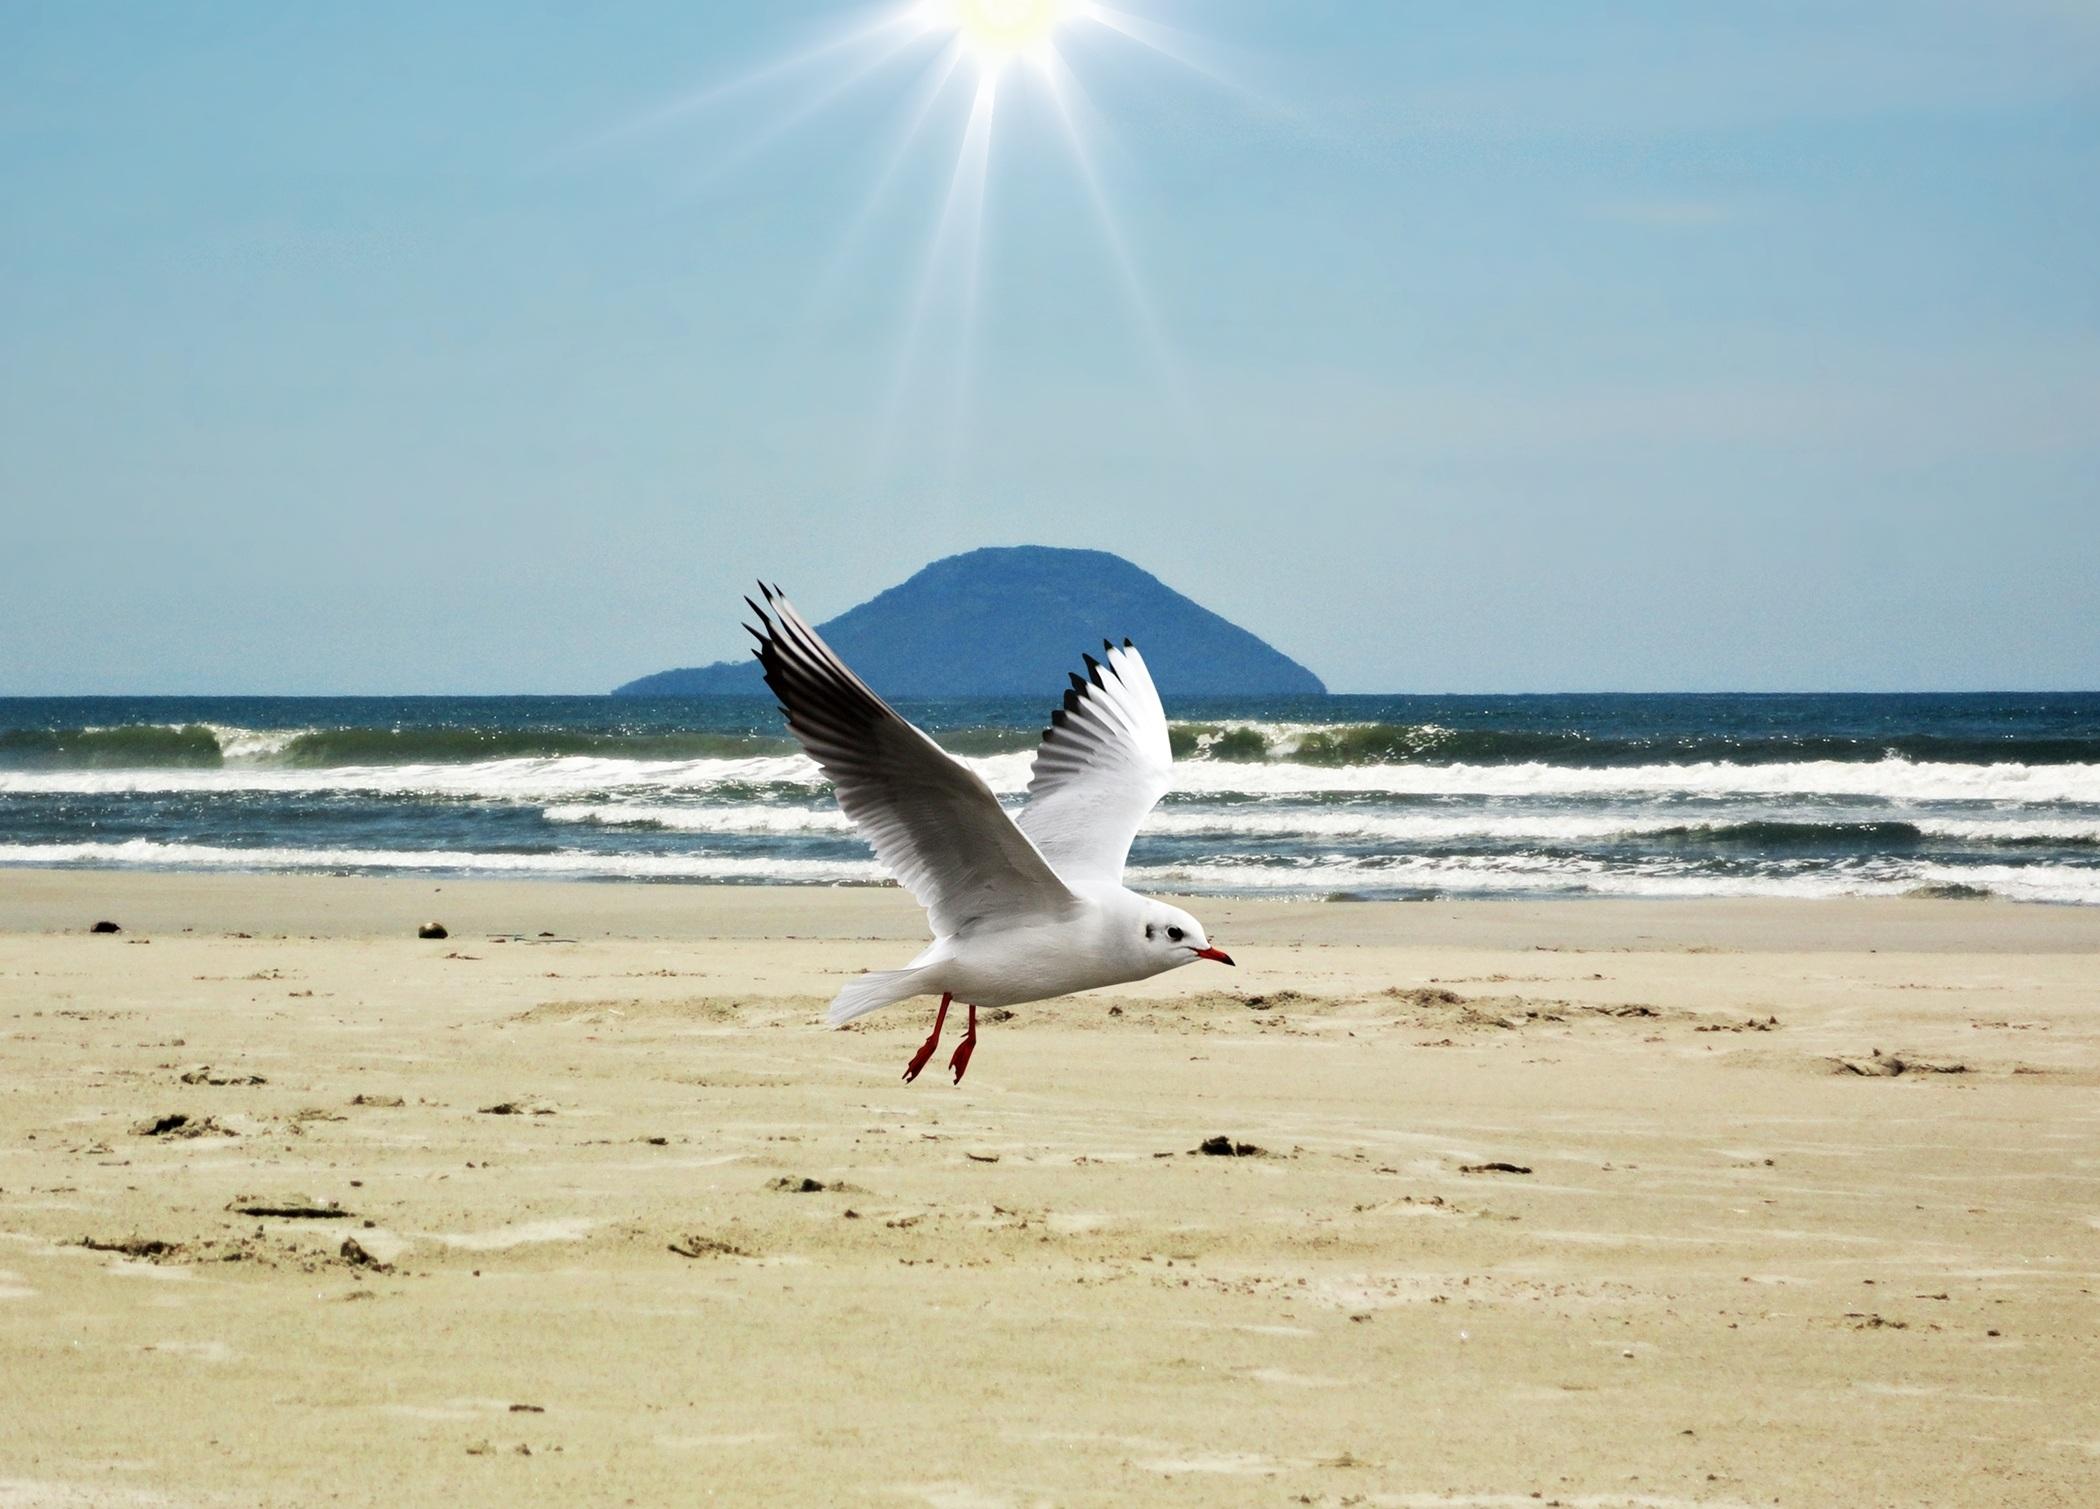 Картинки море чайки пляж, открытки благодарностью